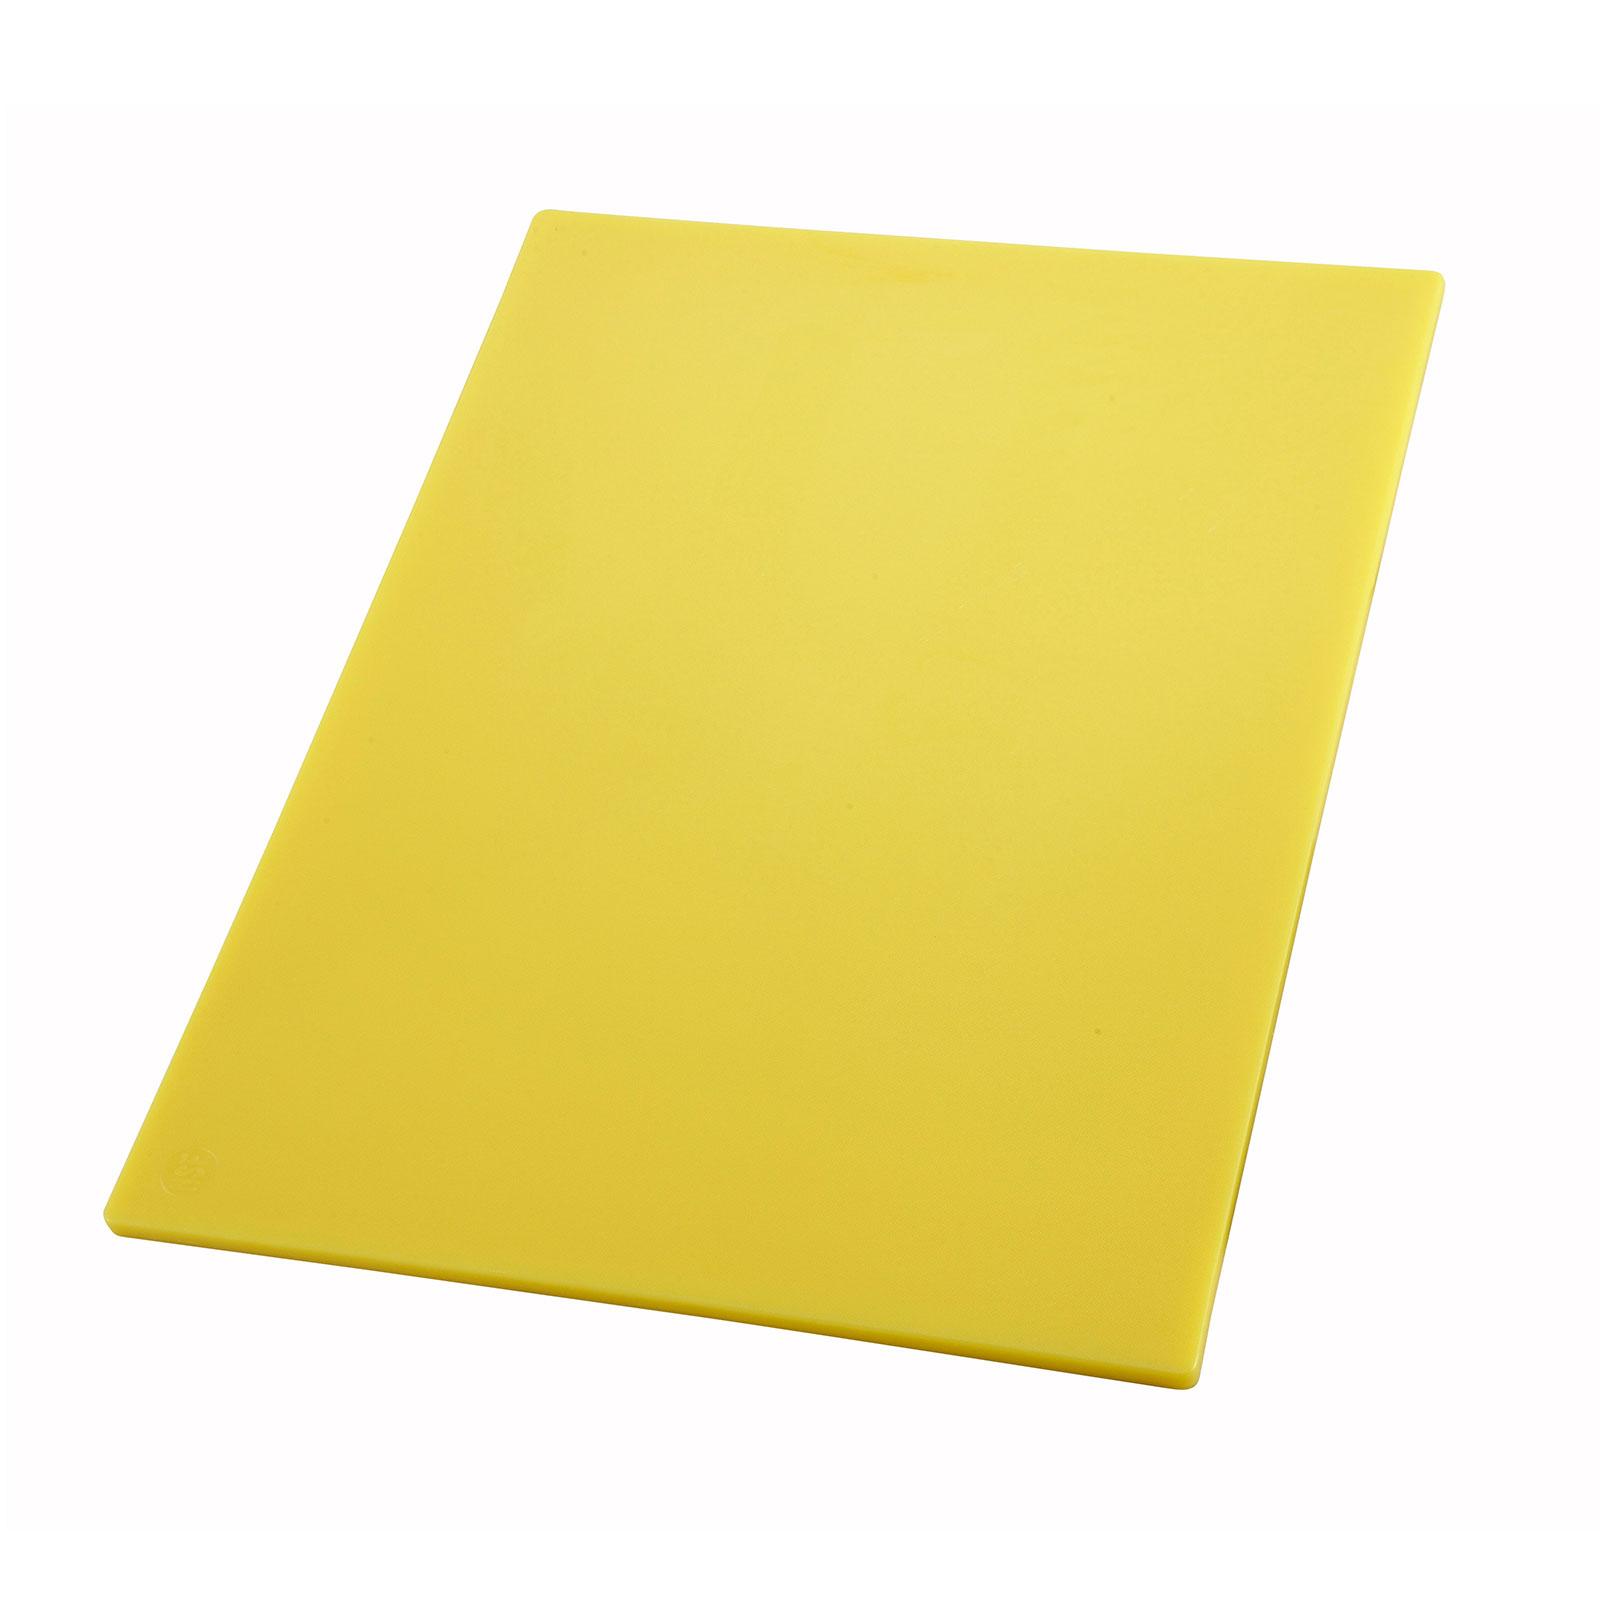 1700-35 Winco CBYL-1520 cutting board, plastic